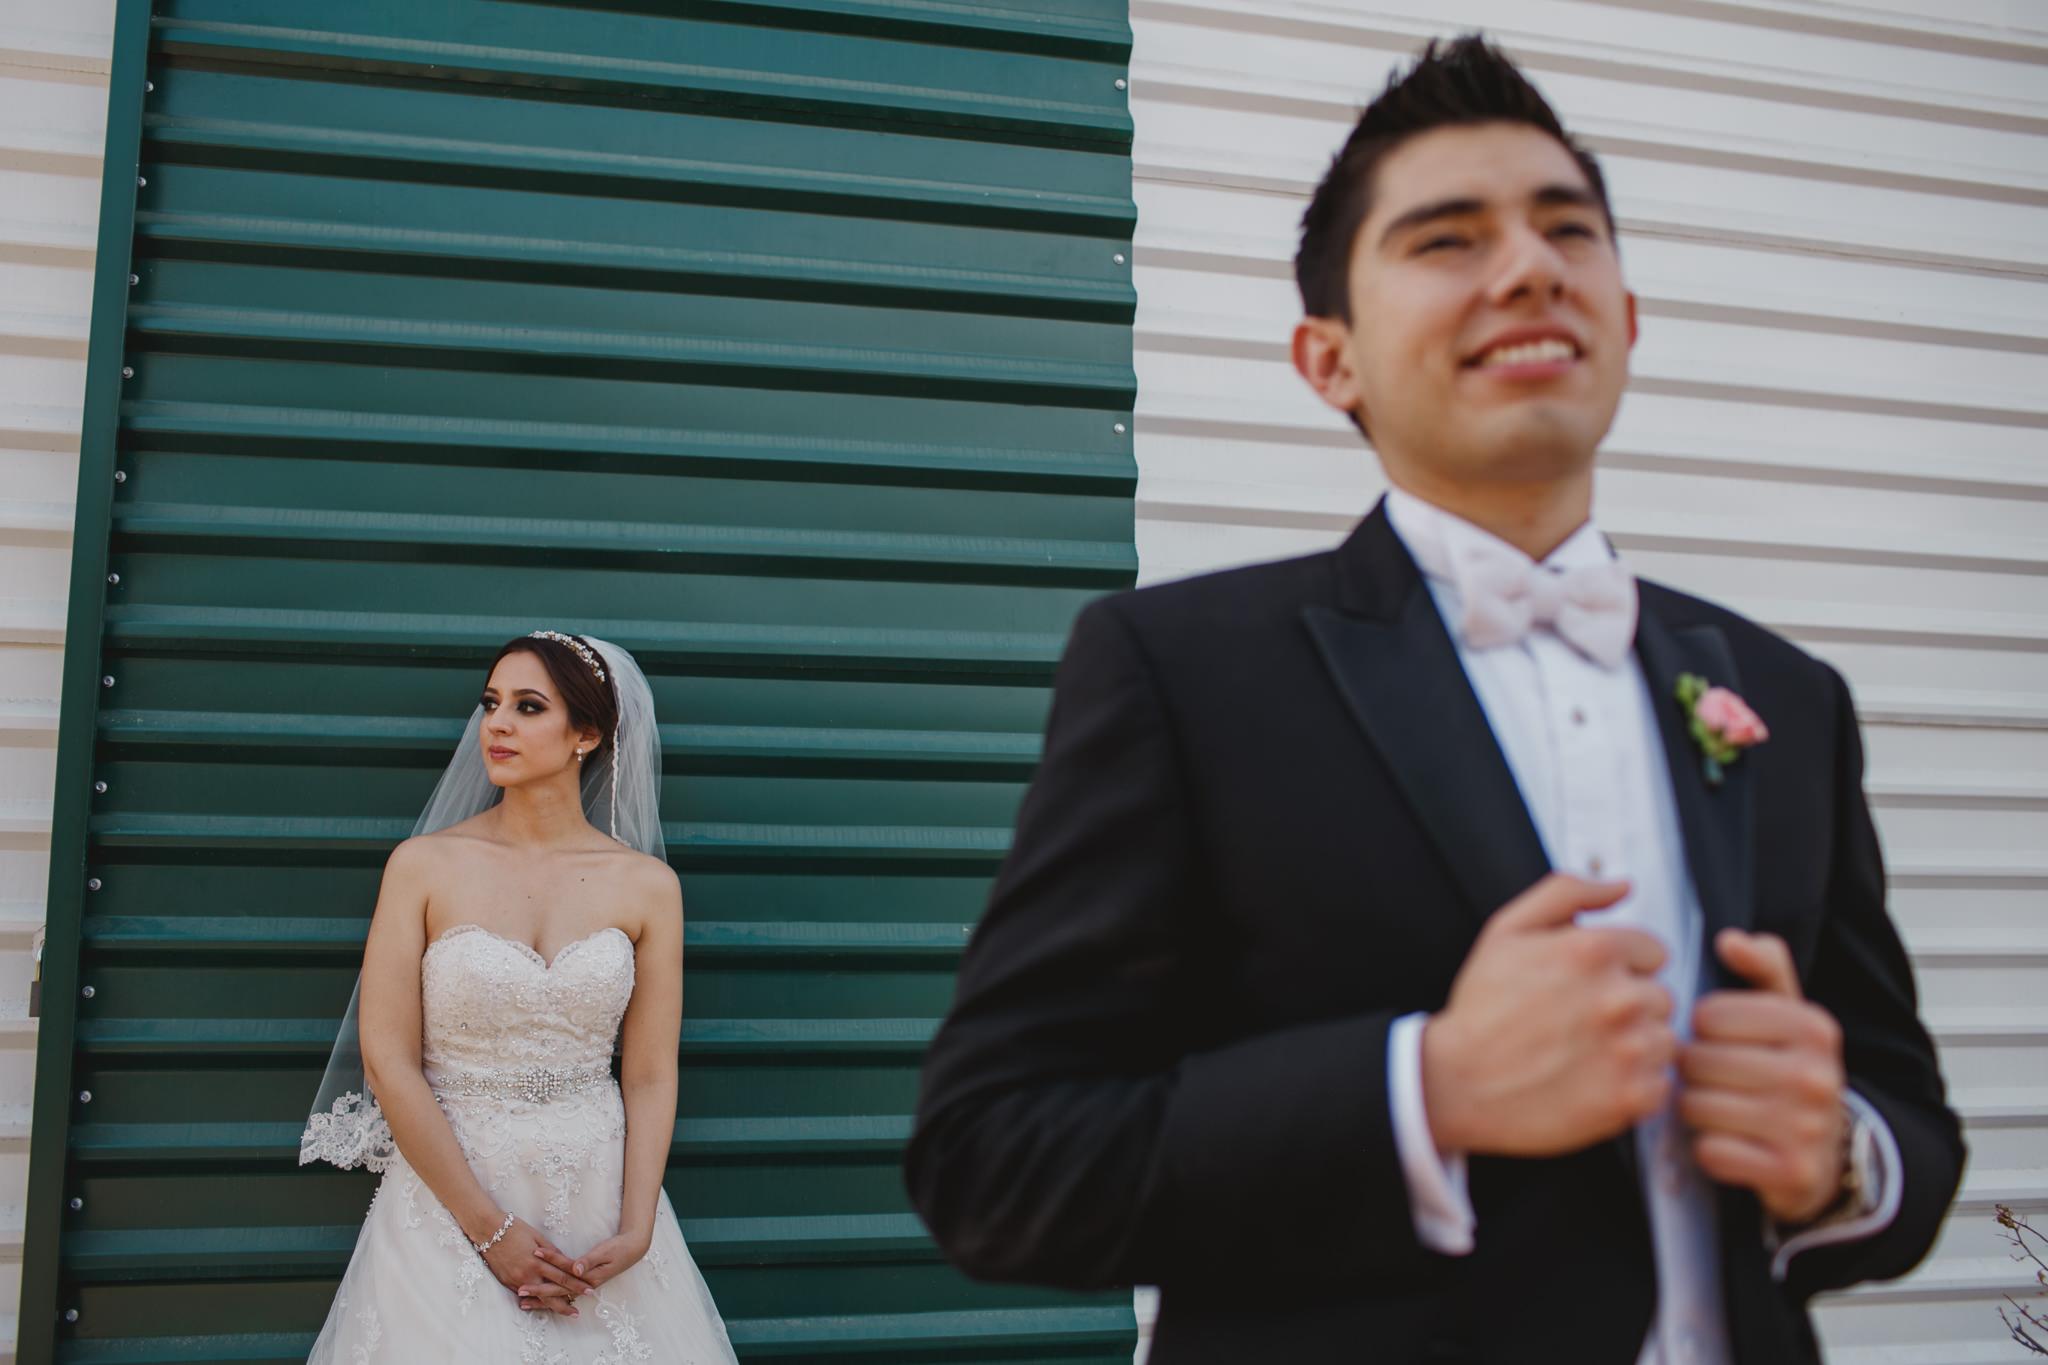 boda-en-torreon-armando-aragon-17